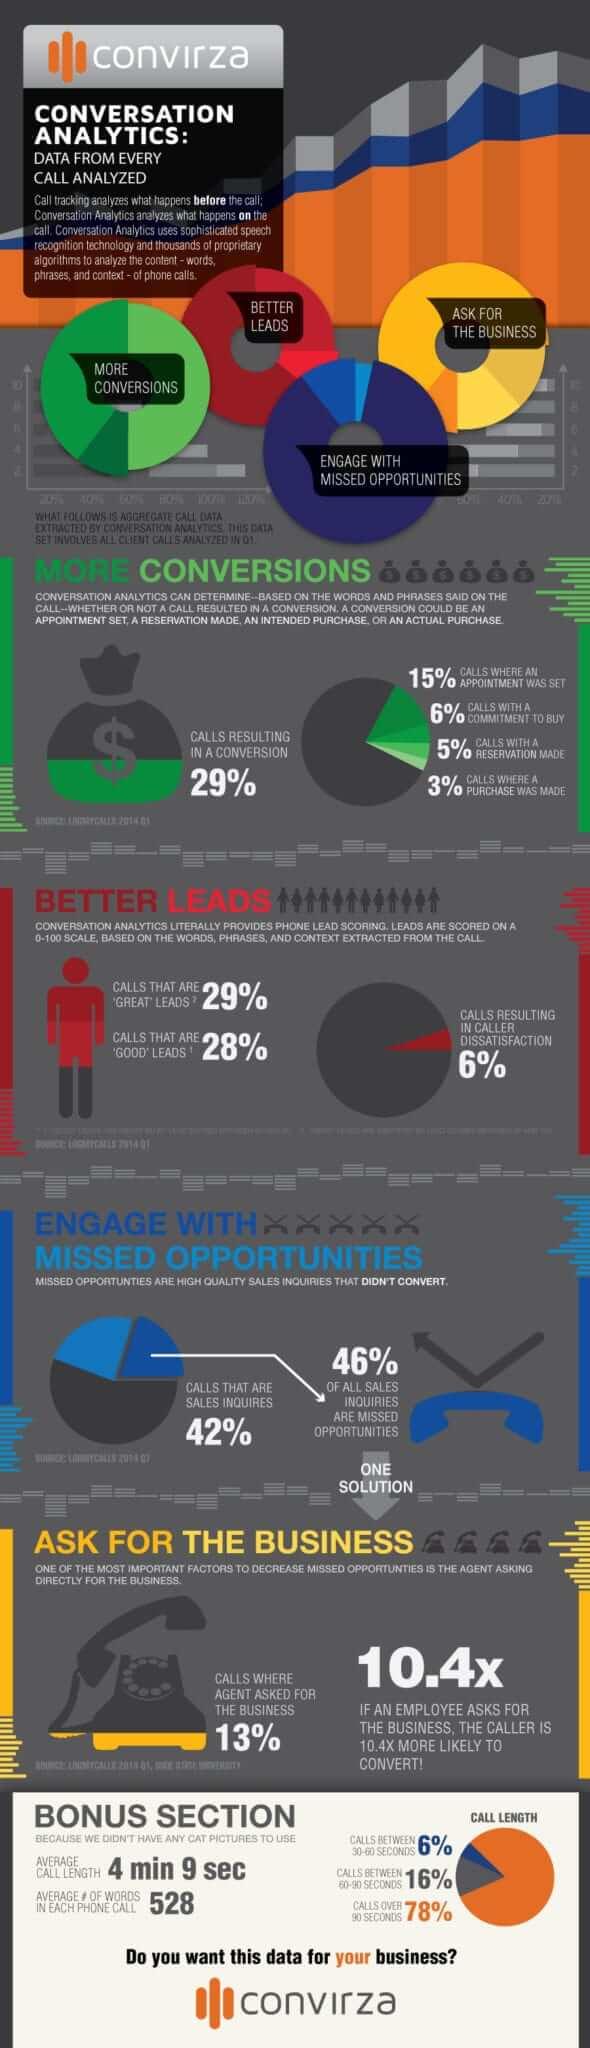 Convirza-infographic-Q1-CA-2